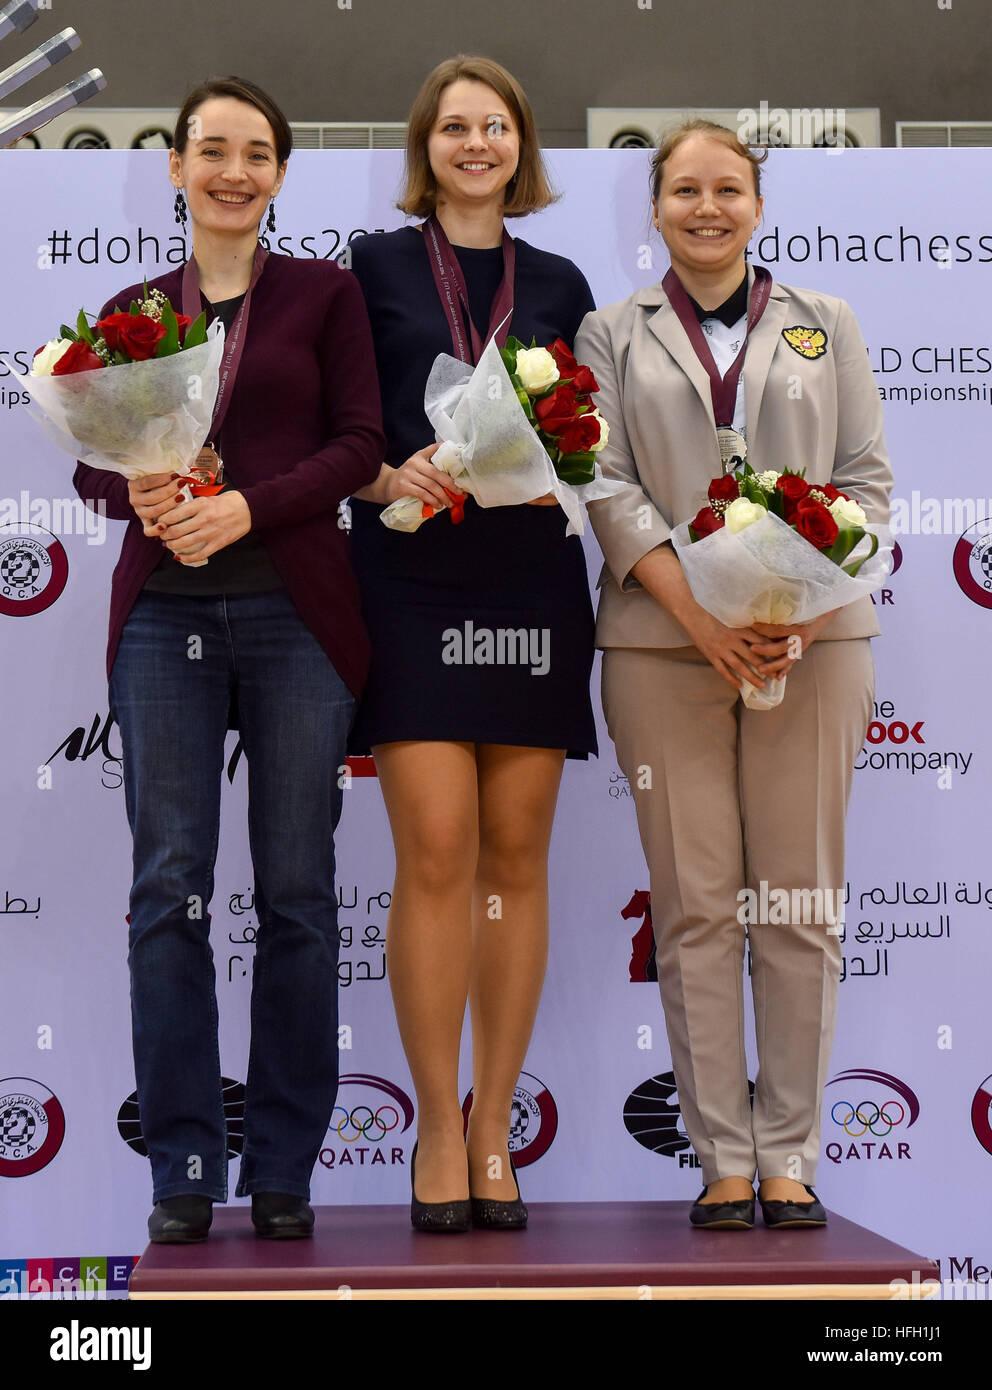 Doha, Qatar. 30th Dec, 2016. Bronze medalist Kateryna ...